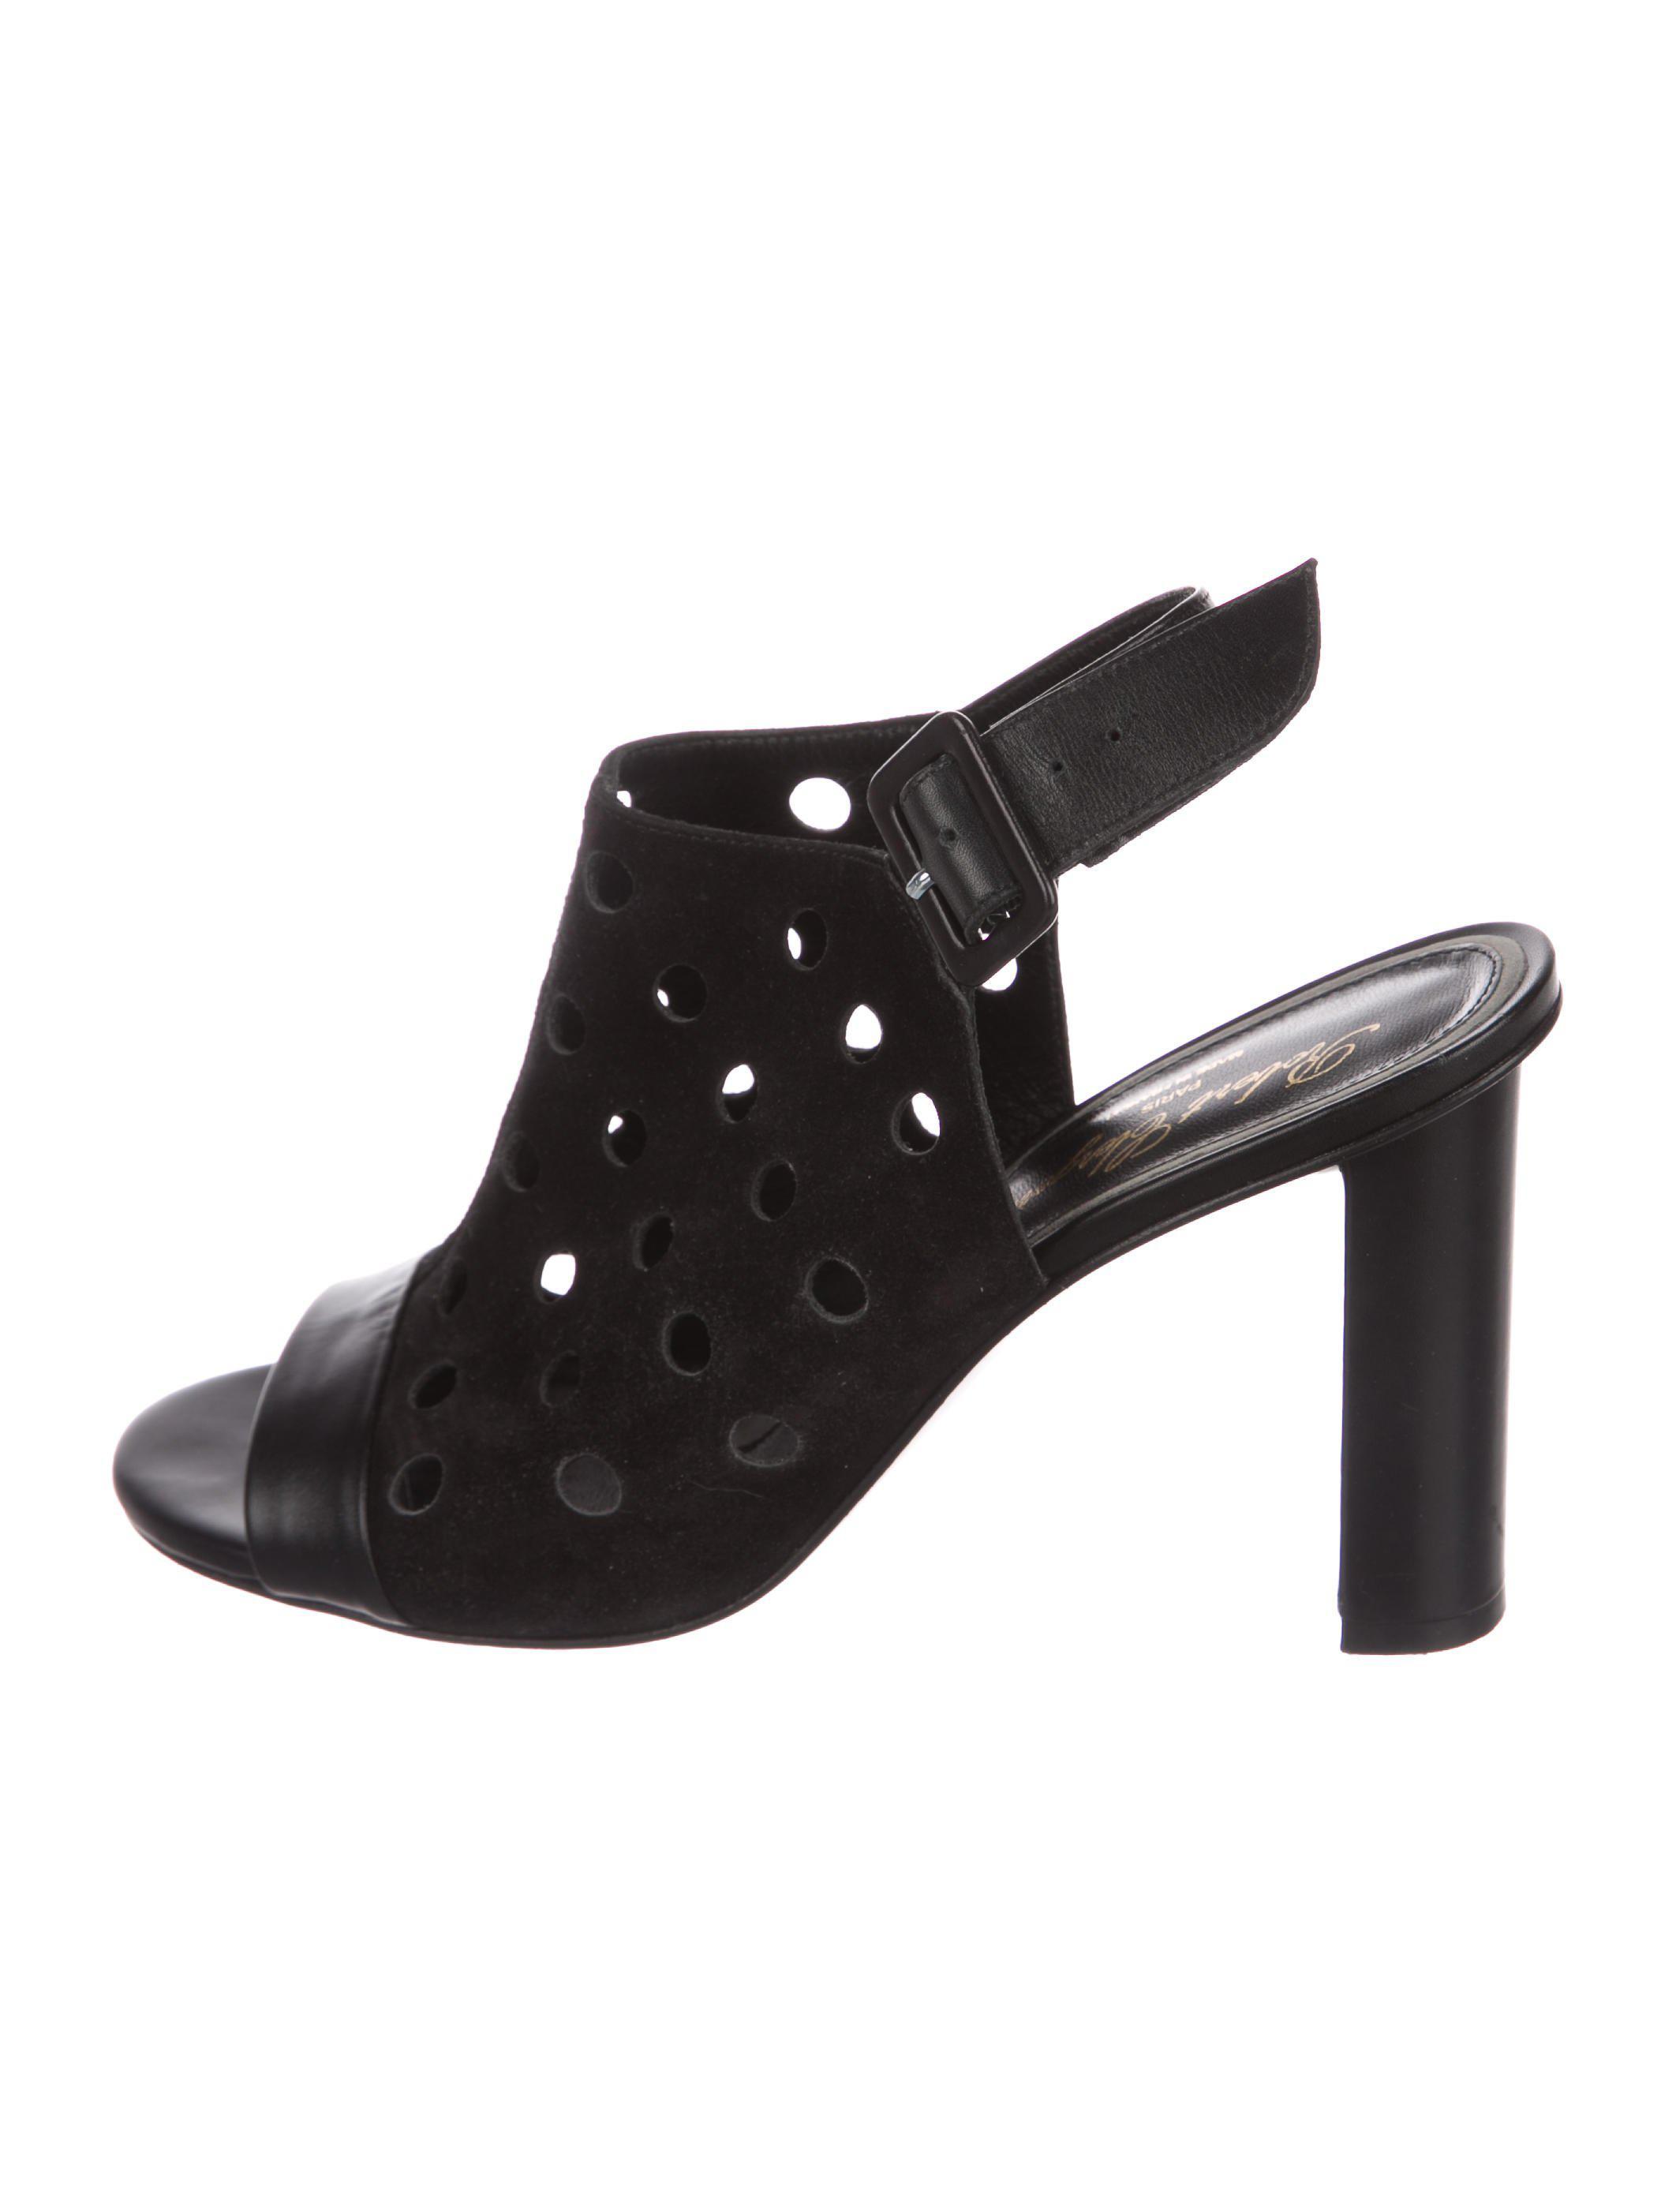 Robert Clergerie Suede Cutout Sandals wide range of cheap online lDO3S27f